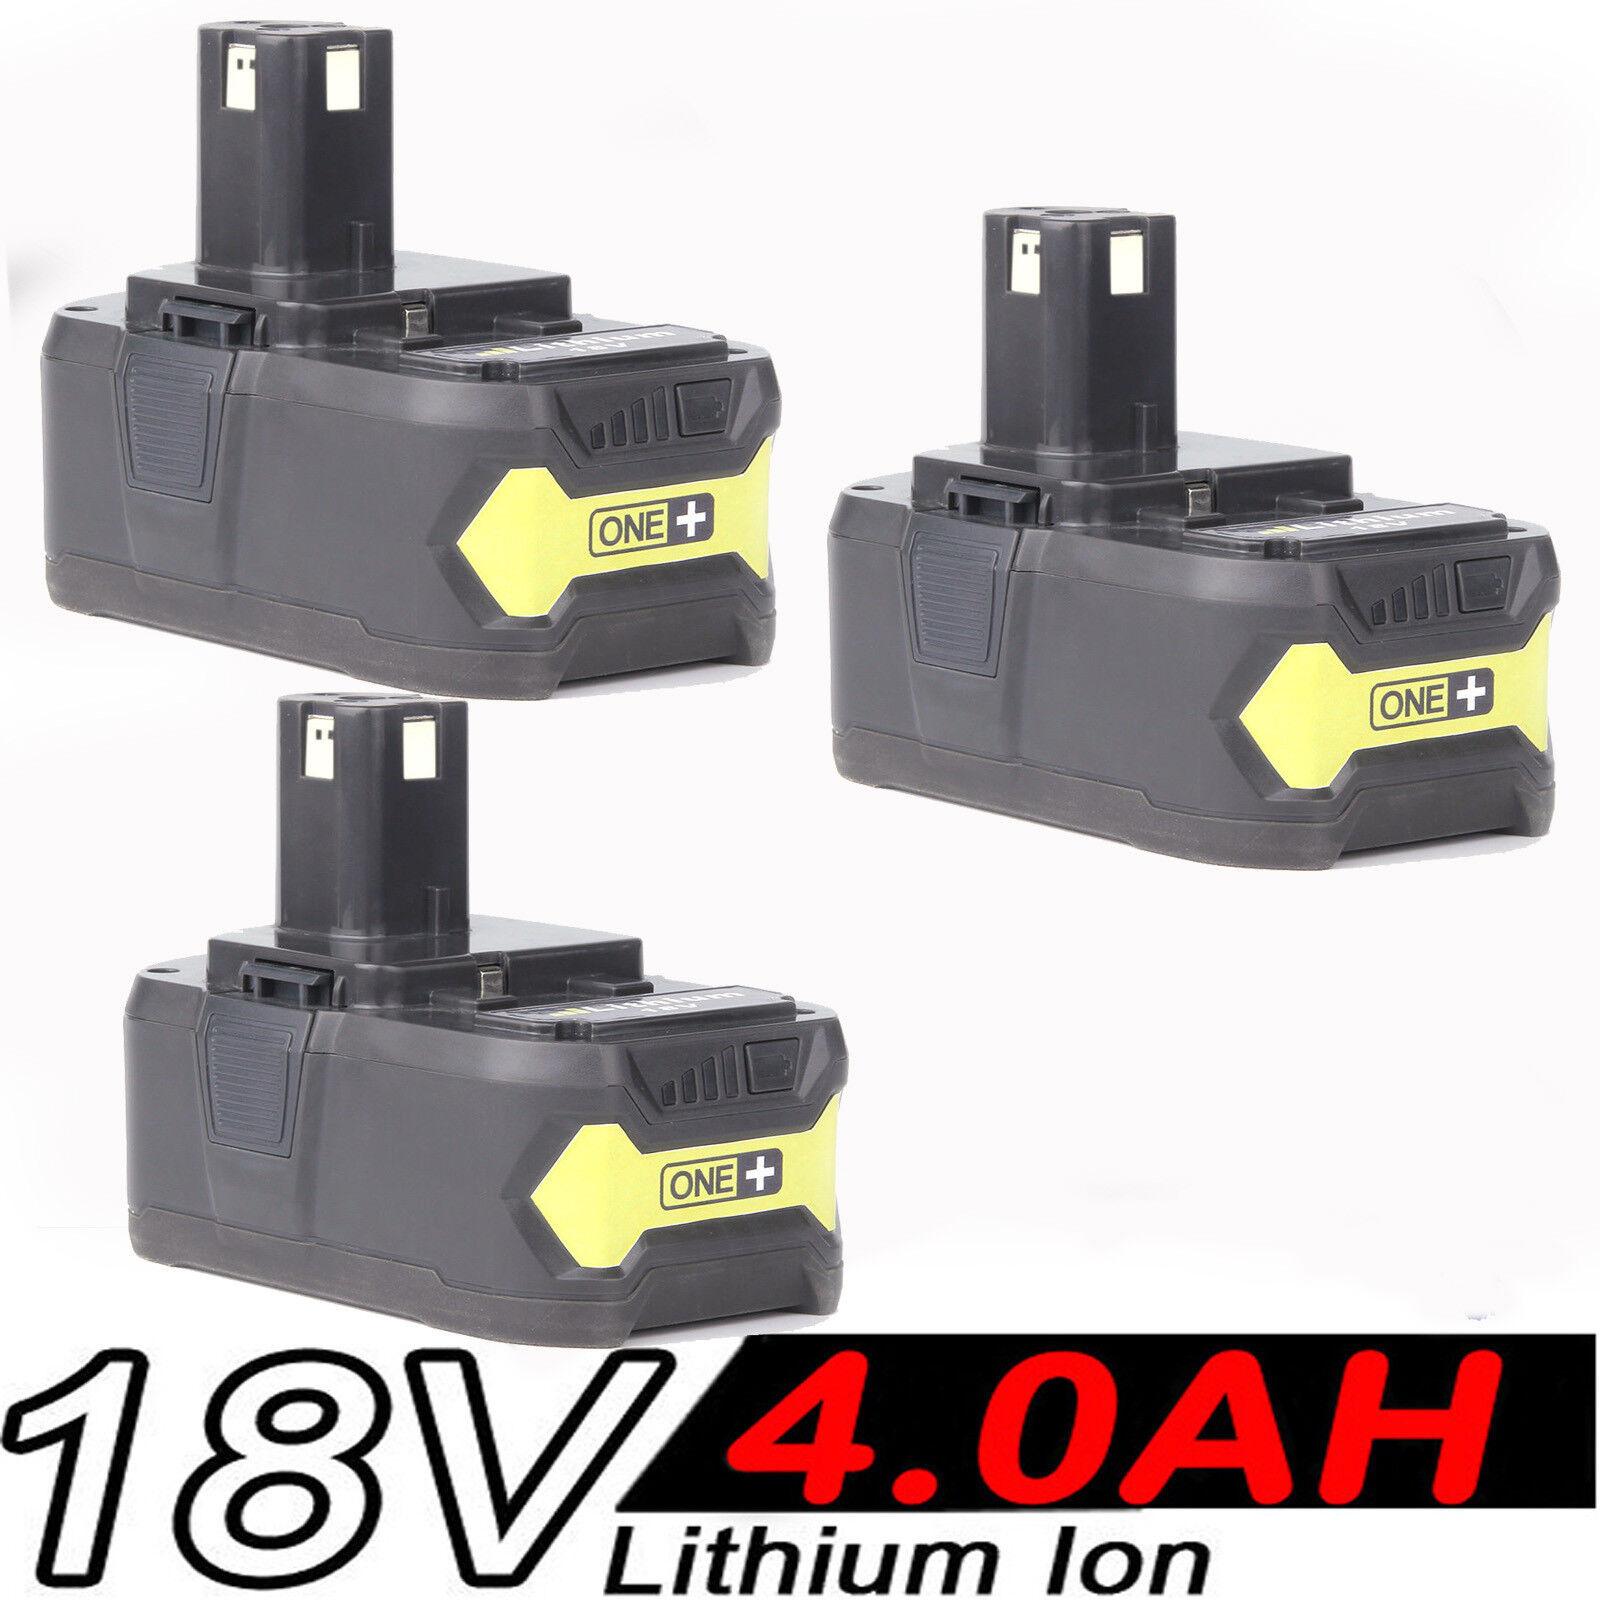 3x 4.0AH 18V Akku für RYOBI One+ RB18L25 RB18L50 P108 P107 P104 P780